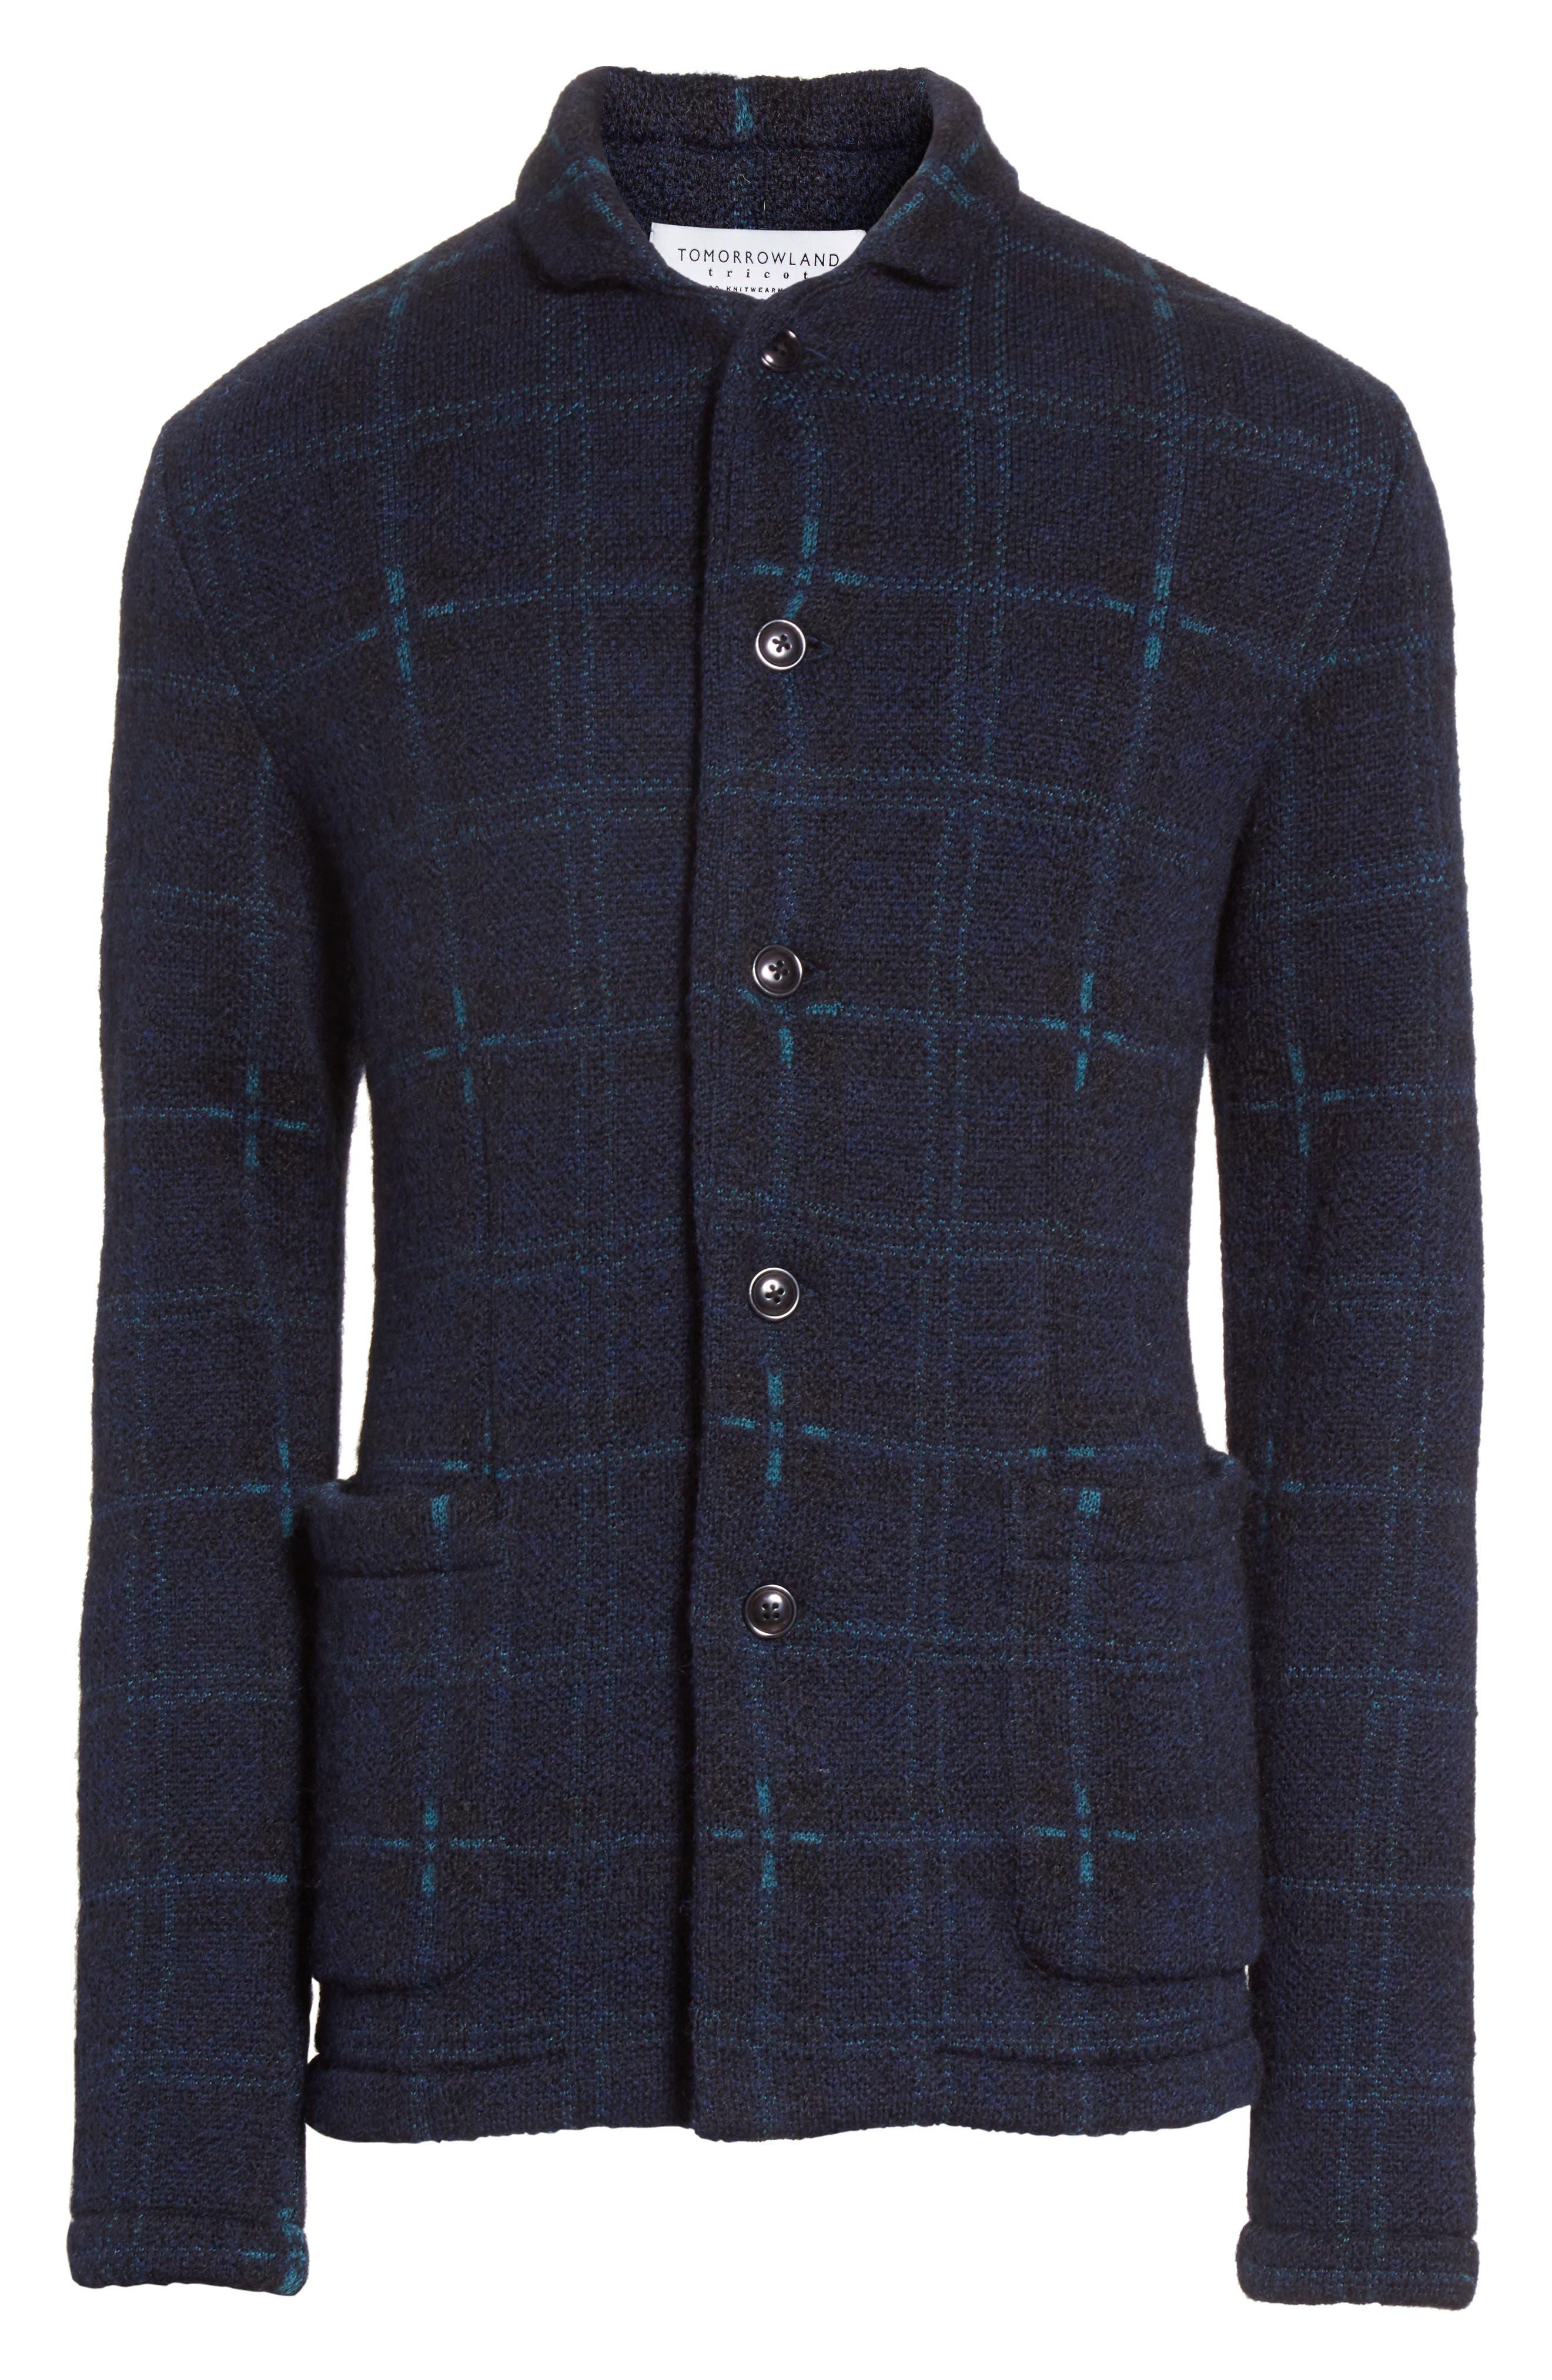 Wool Blend Knit Sportcoat,                             Alternate thumbnail 5, color,                             410